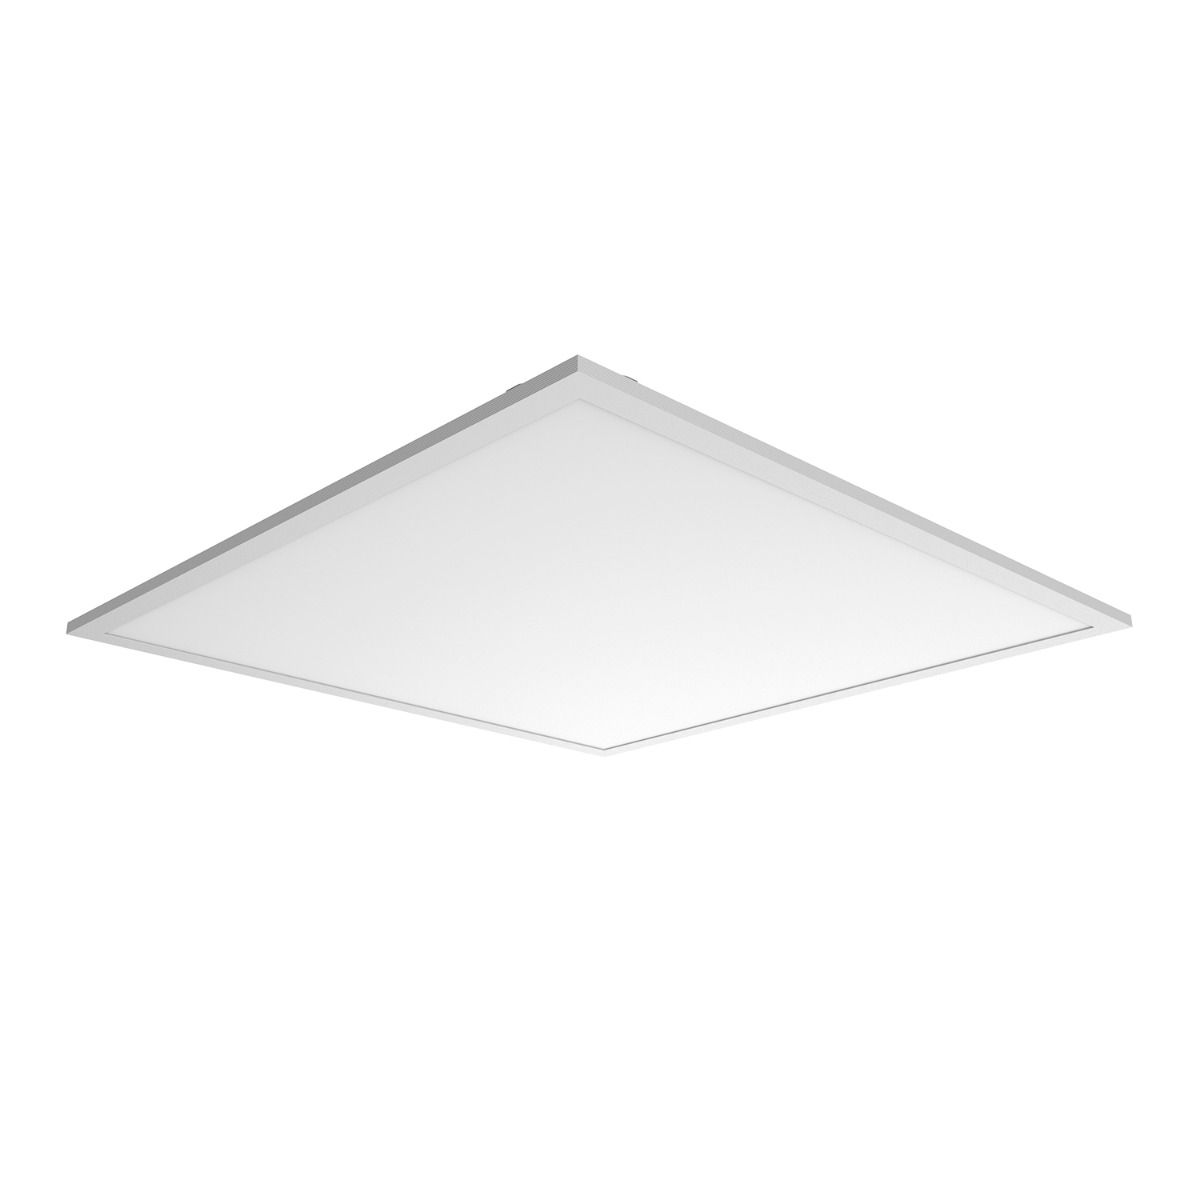 Noxion LED Panel Delta Pro V3 30W 3000K 3960lm 60x60cm UGR <22 | Warmweiß - Ersatz für 4x18W